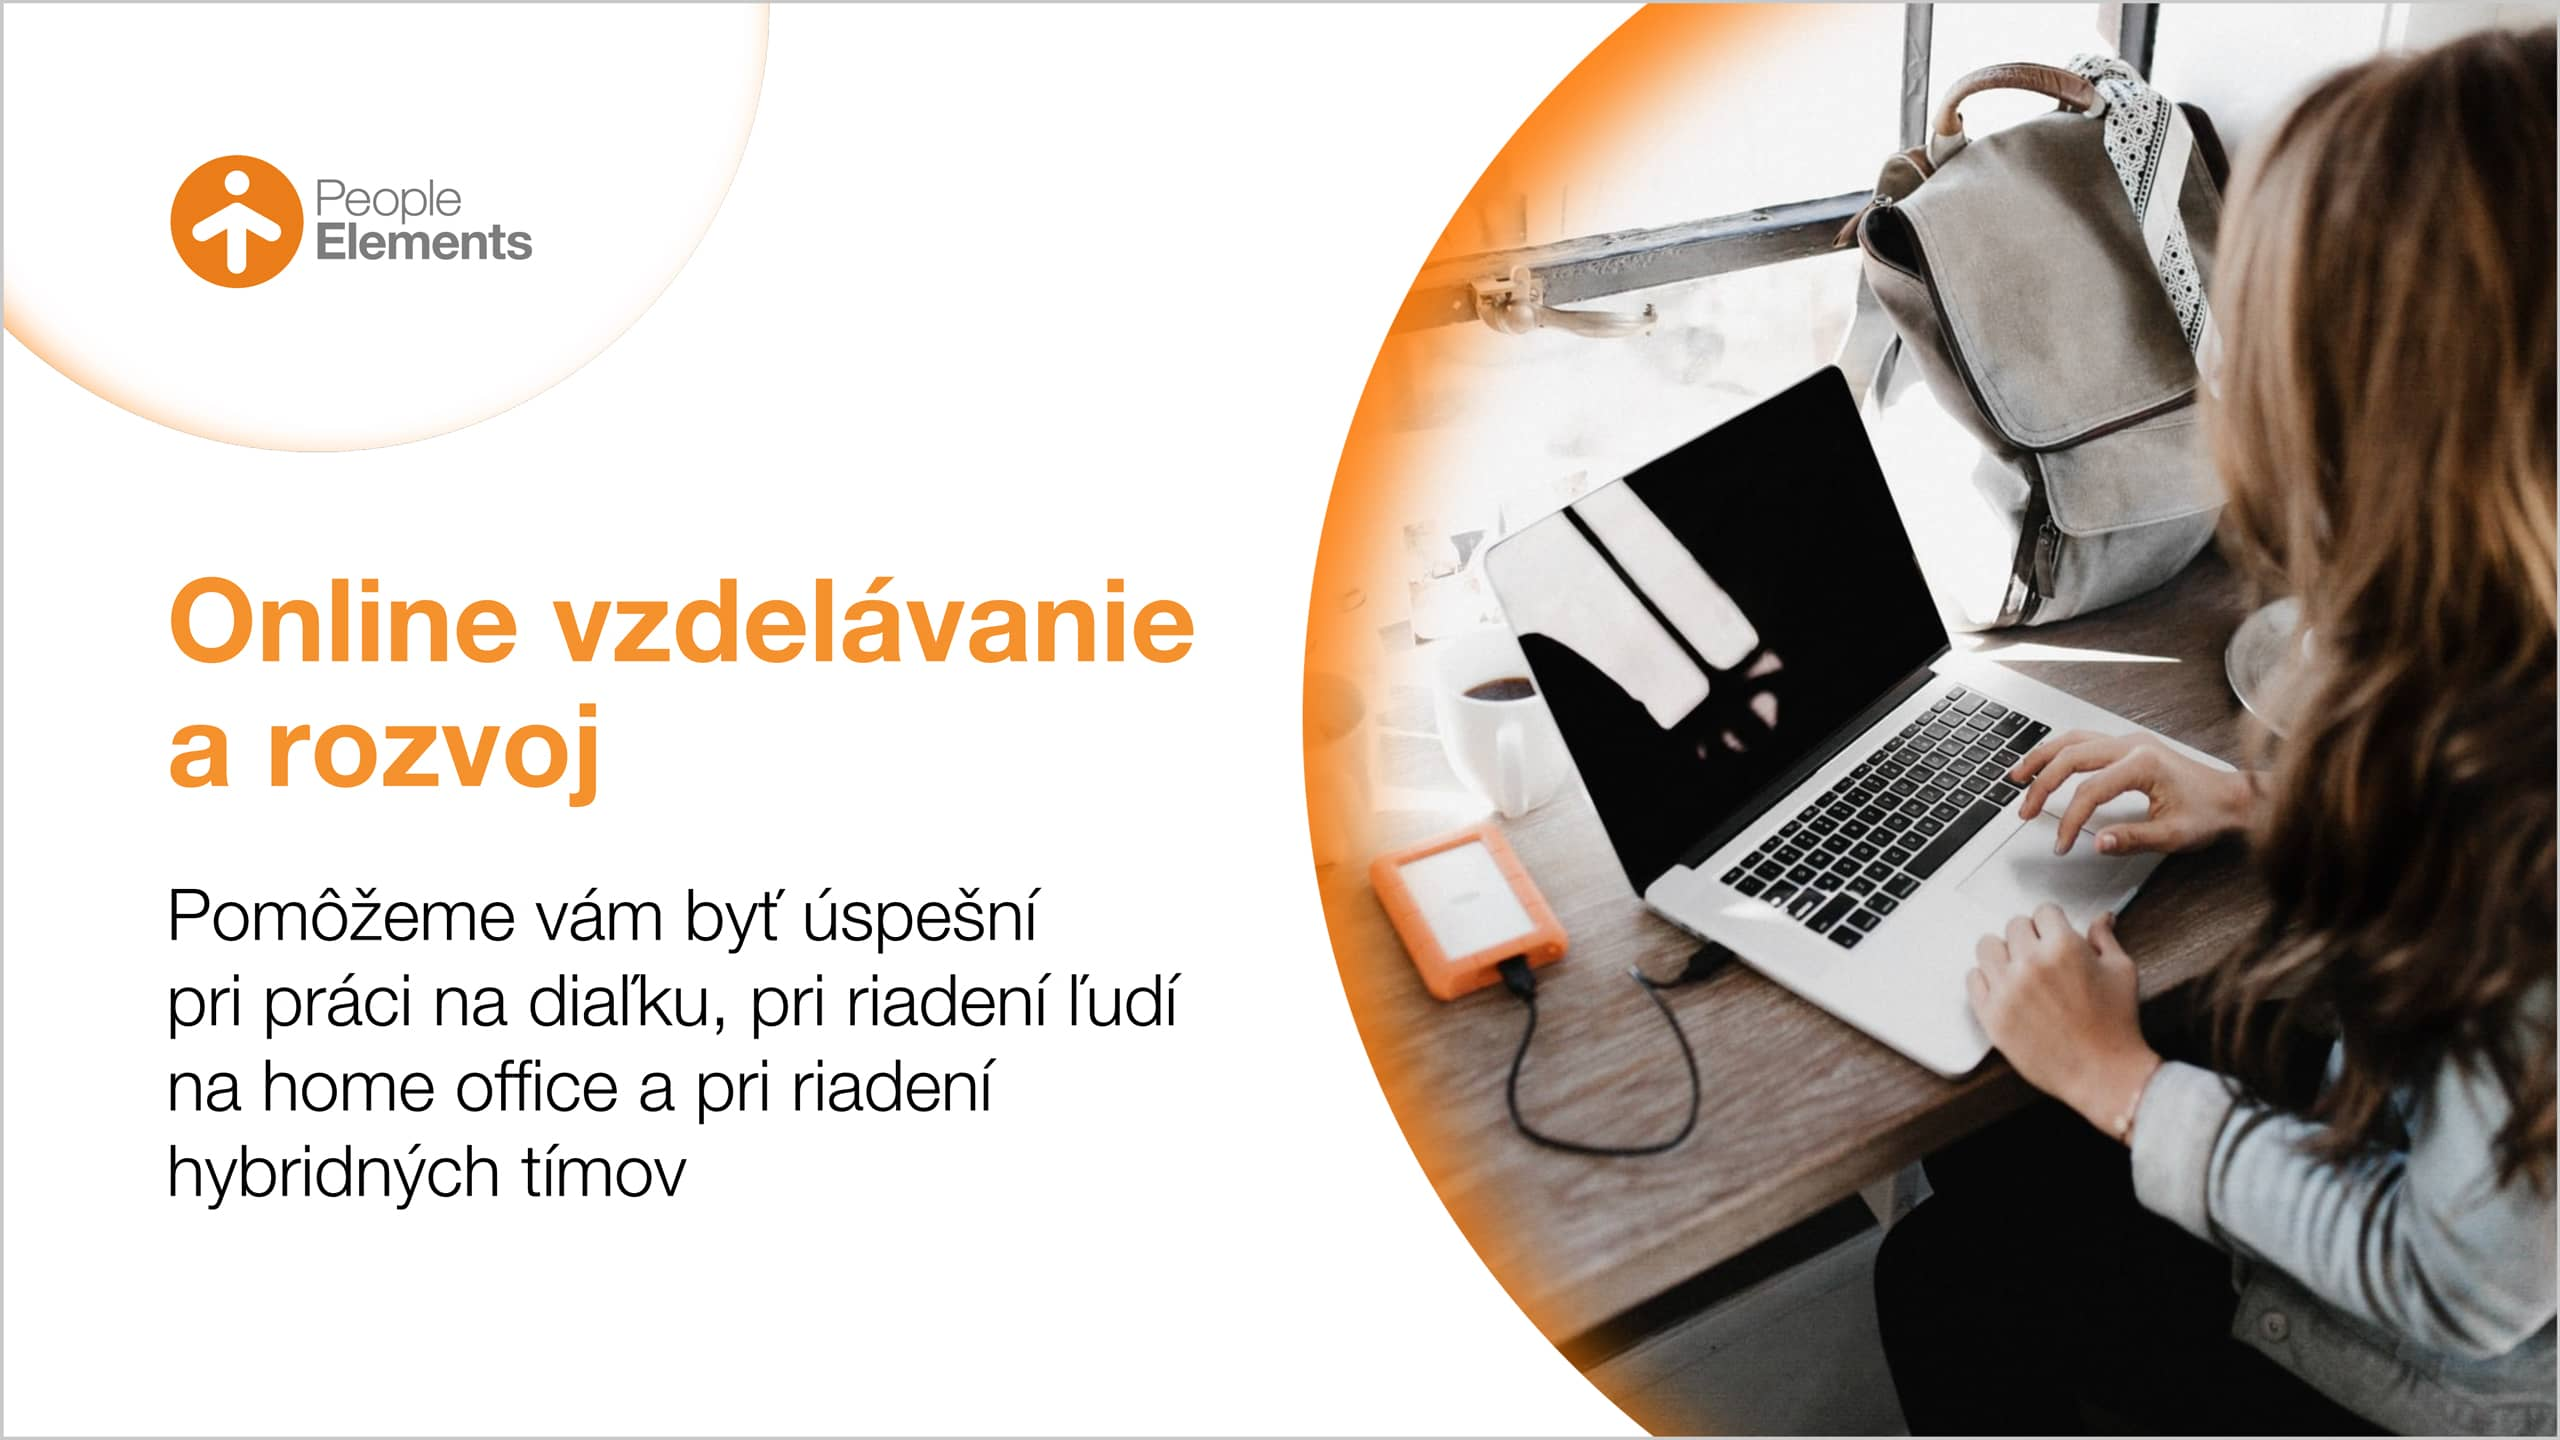 pe-banner-novinky-online-vzdelavanie-1920x1080@2x-c